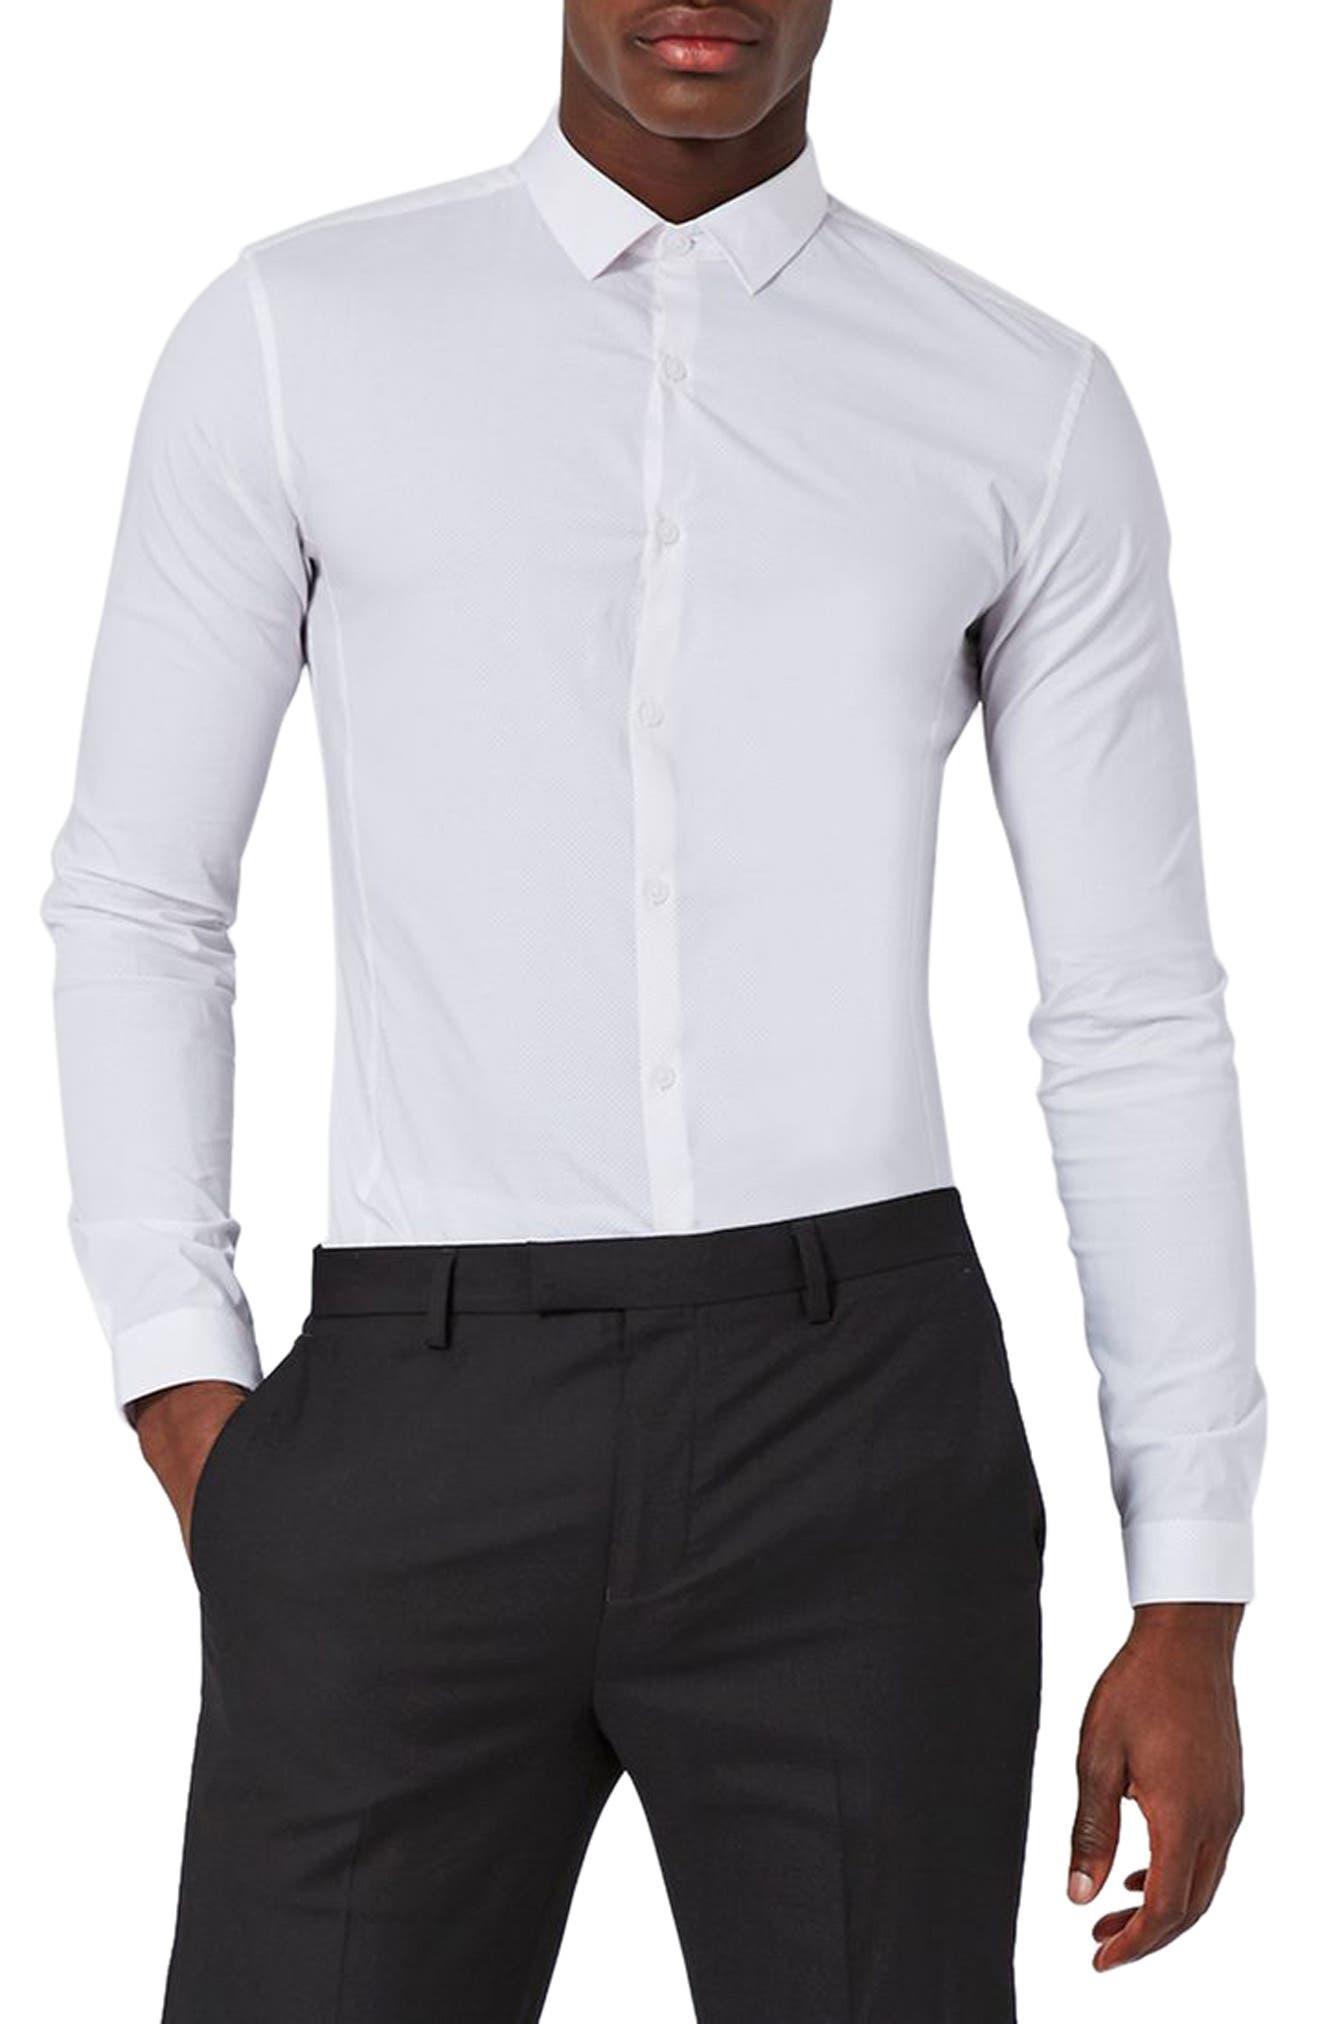 Main Image - Topman Muscle Fit Polka Dot Shirt